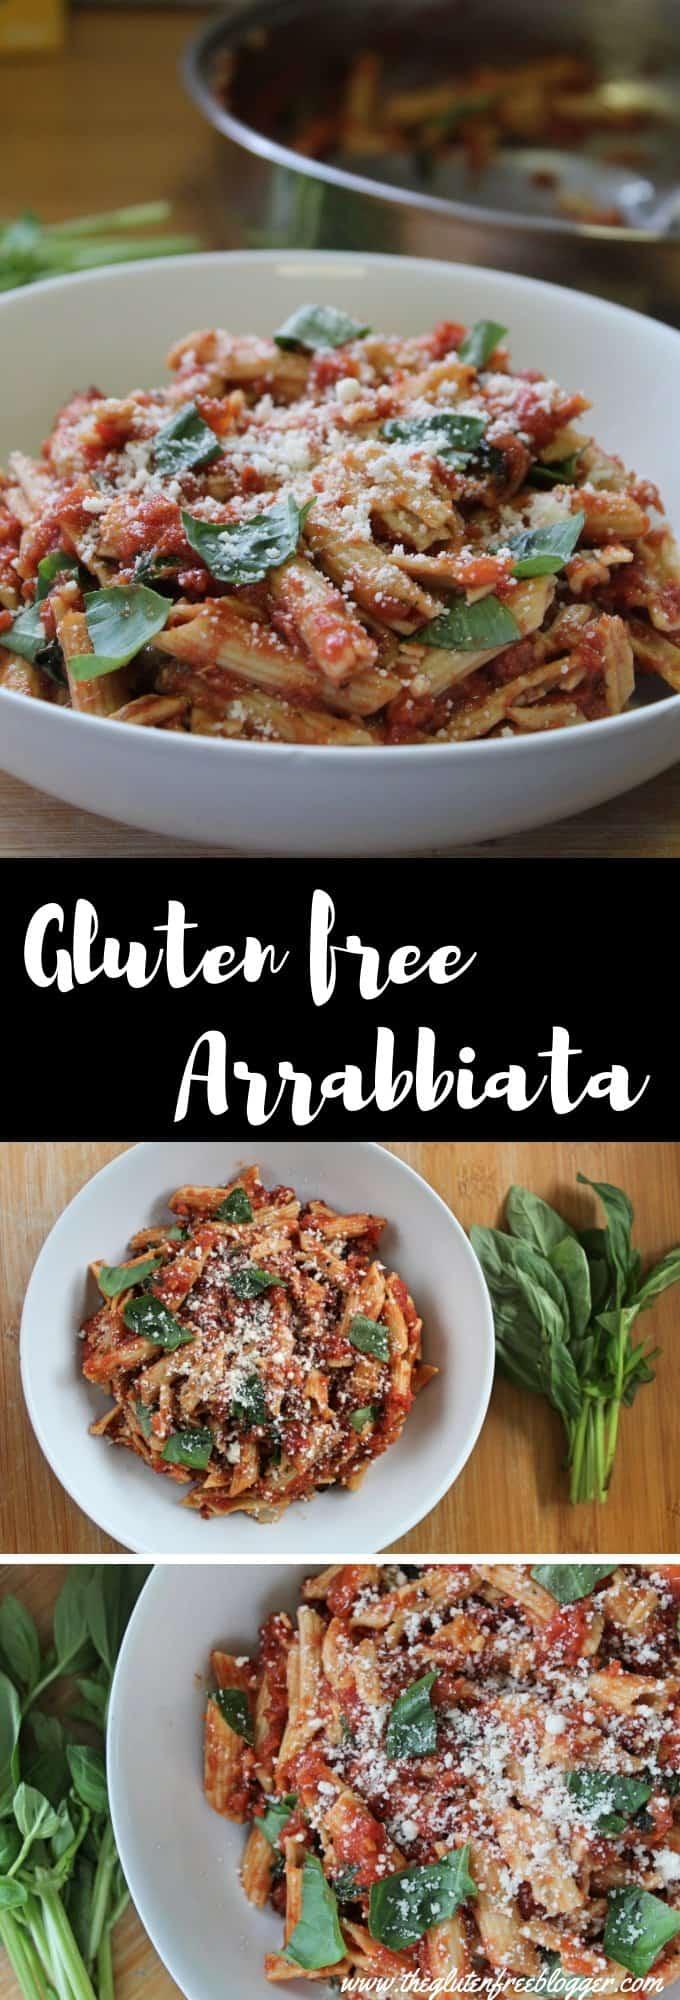 gluten free arrabbiata recipe - gluten free pasta - easy dinner ideas - midweek meal - coeliac